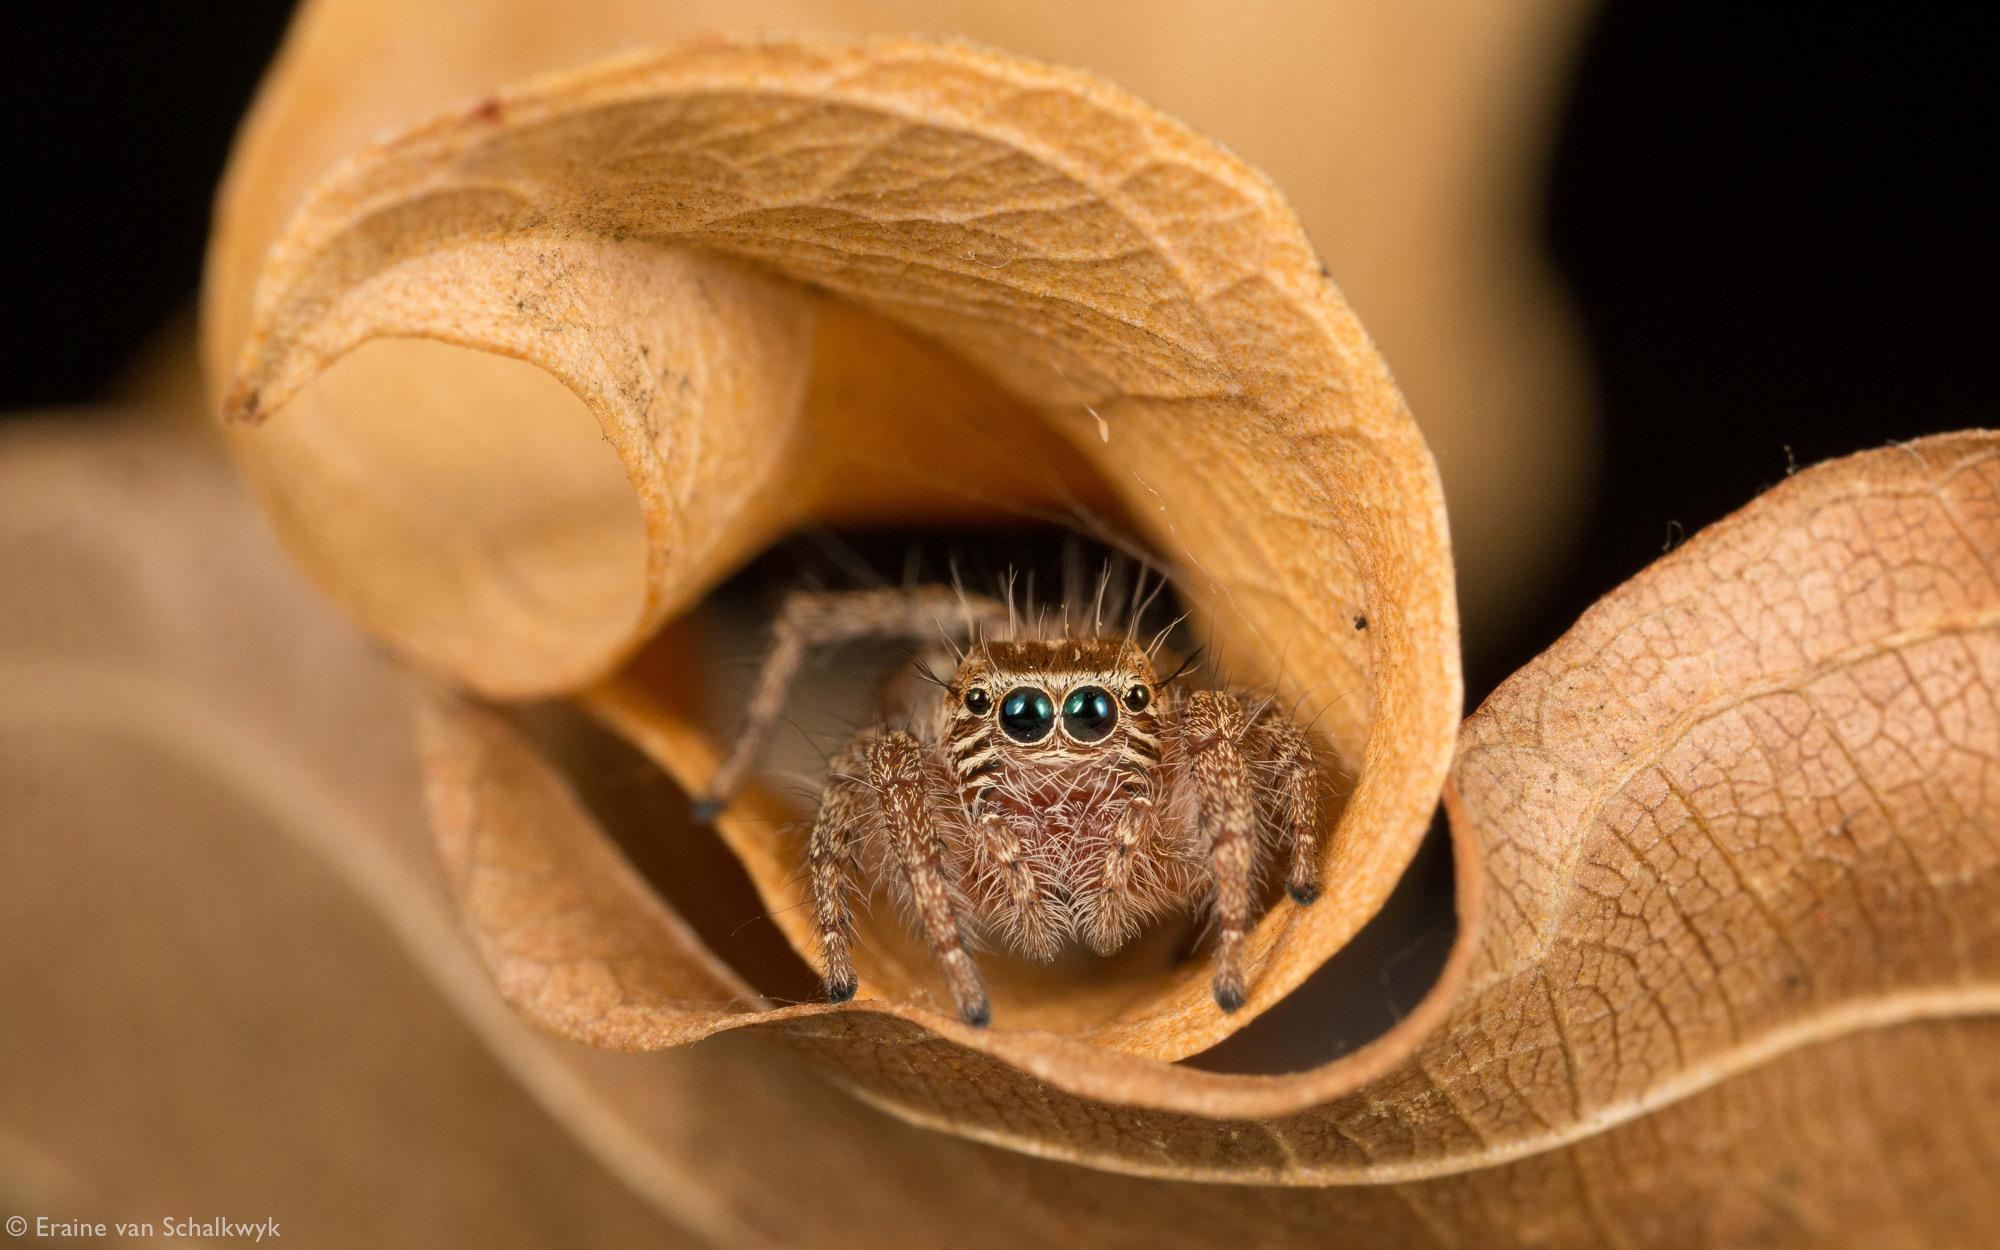 Jumping spider (Hyllus sp.) amongst leaf litter, spider, arachnid, macro photography